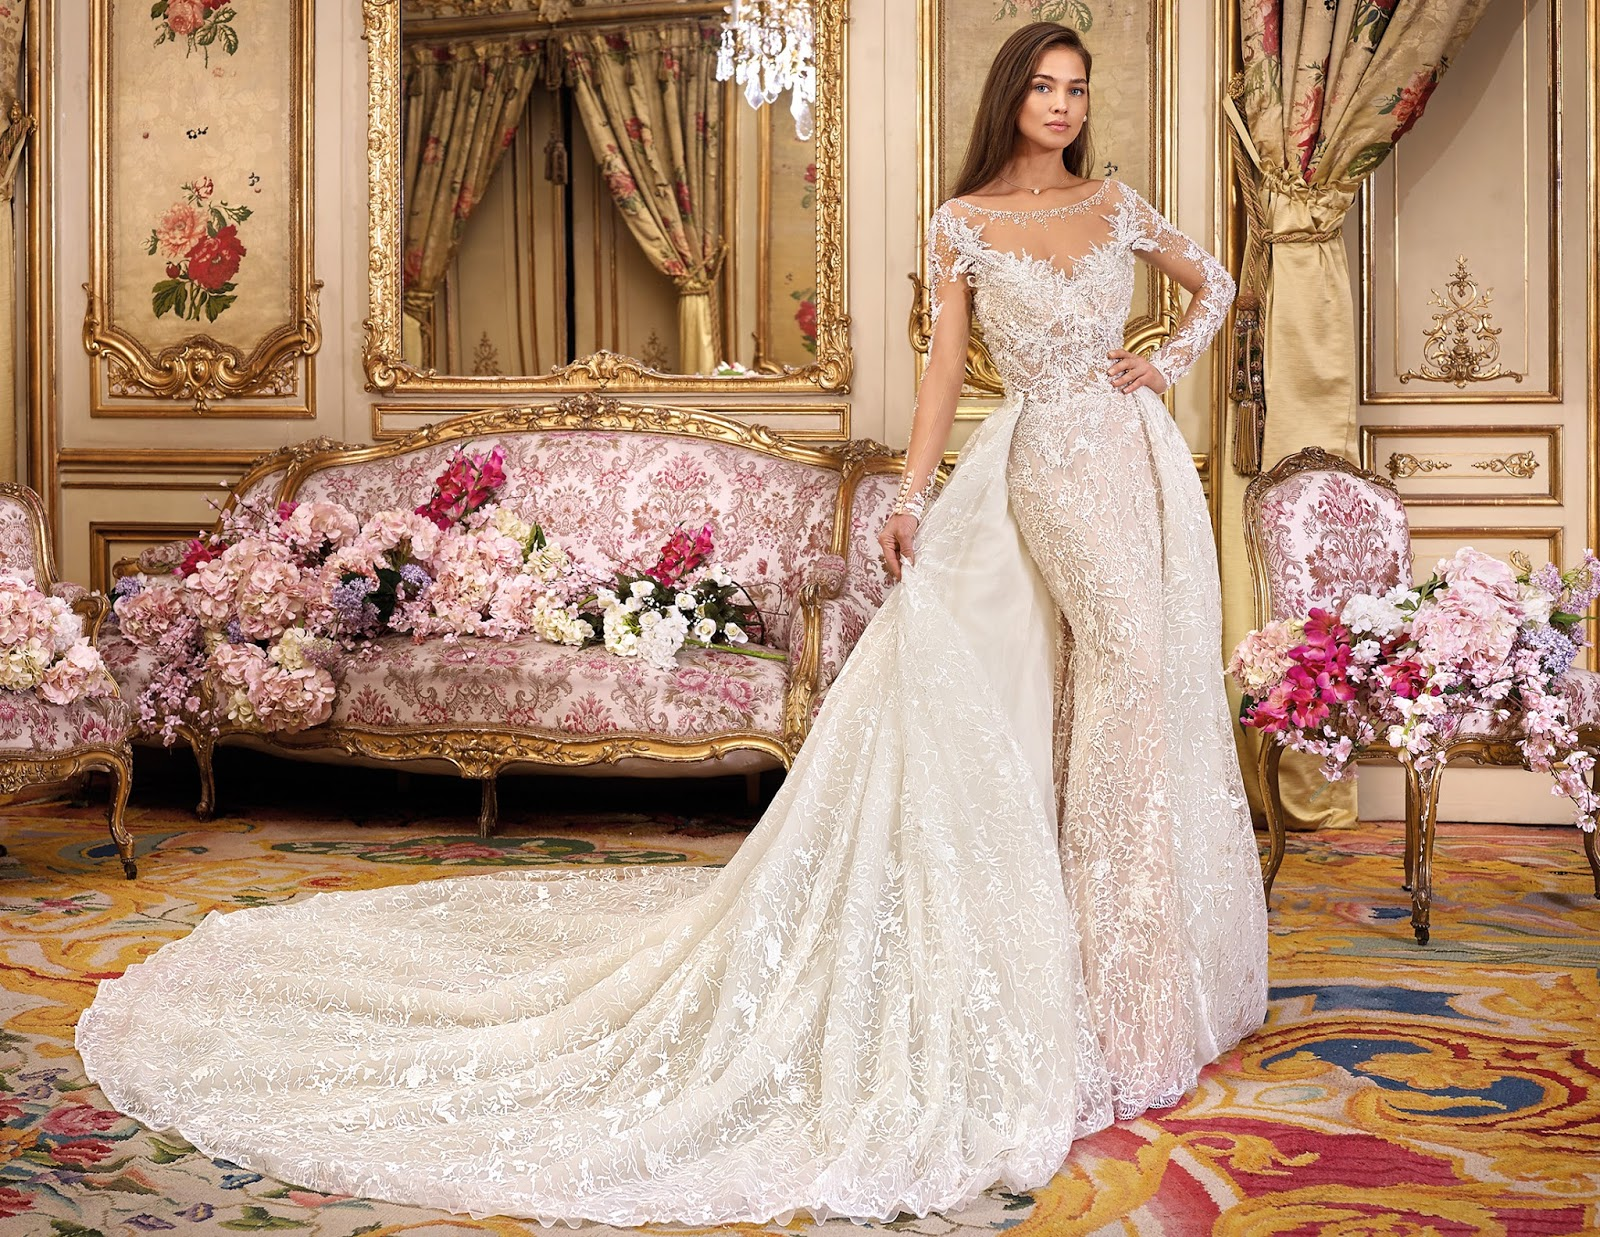 Demetrios Wedding Dress Prices 85 Stunning Dreams do bee reality